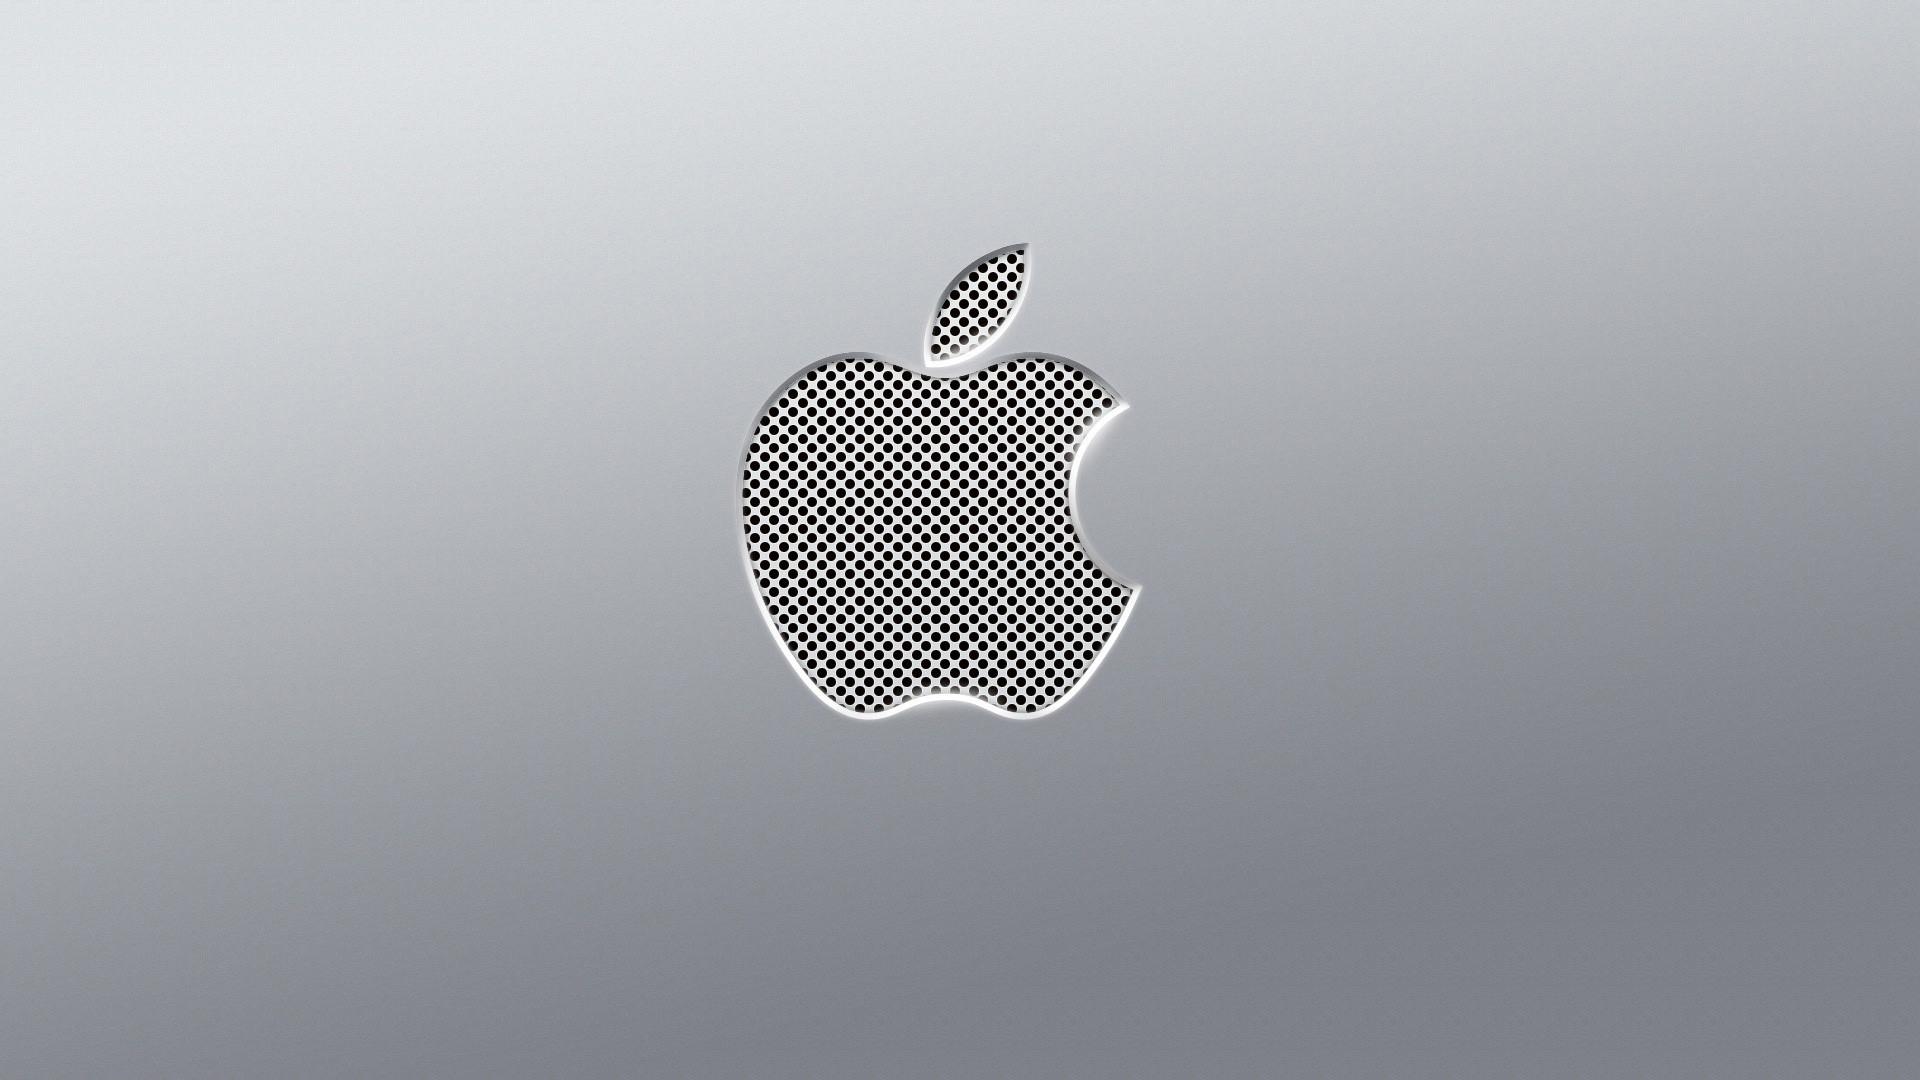 Metal Apple Wallpaper (71+ Images